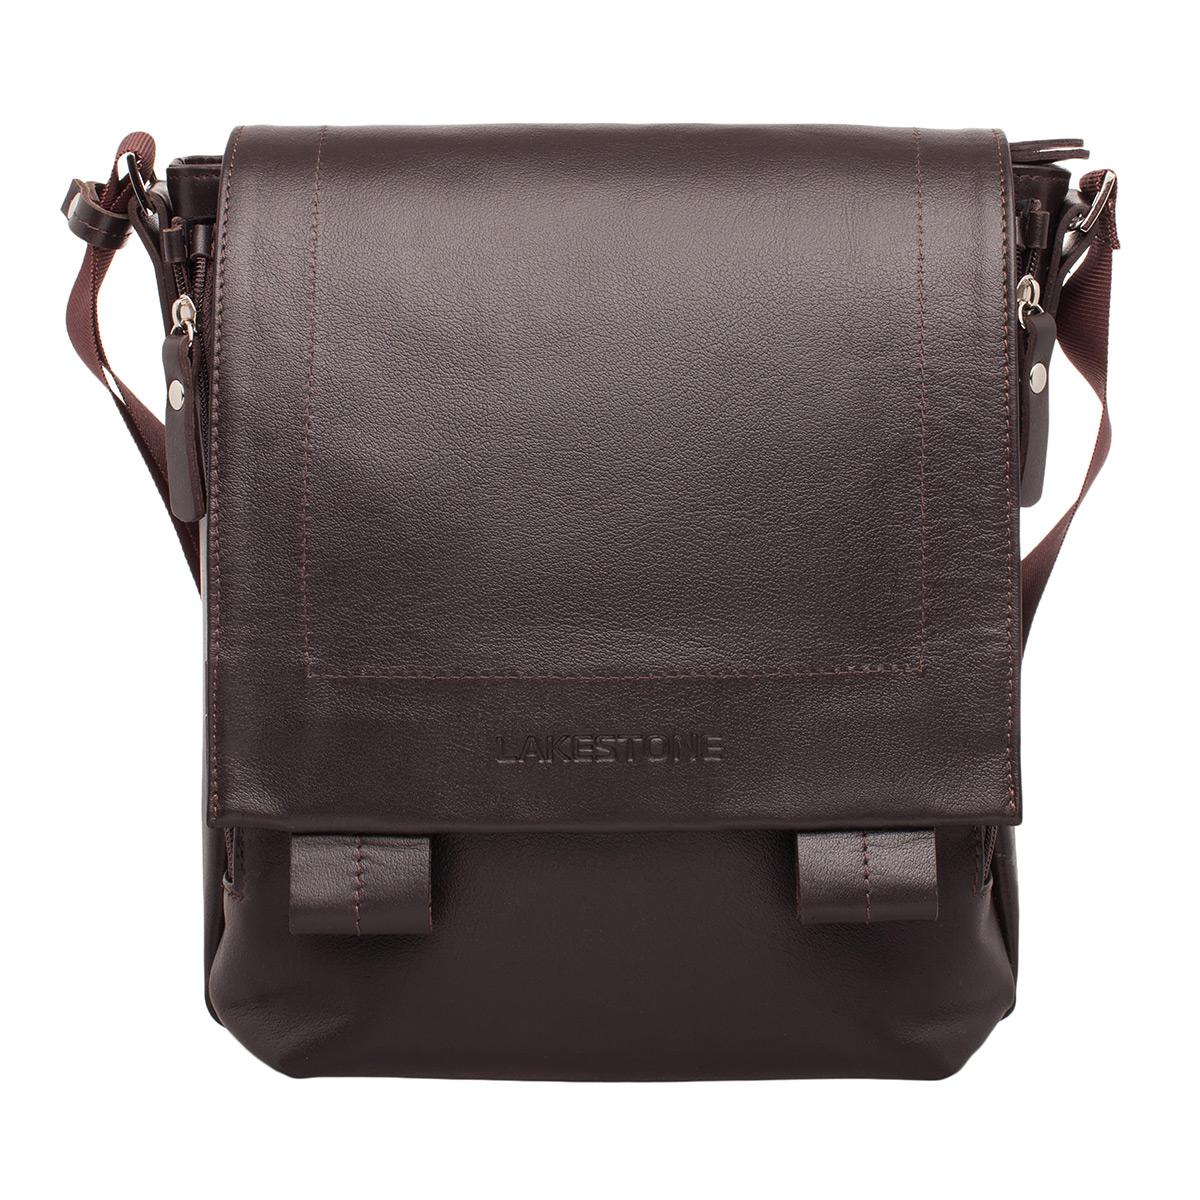 Кожаная сумка через плечо Cherington Brown фото